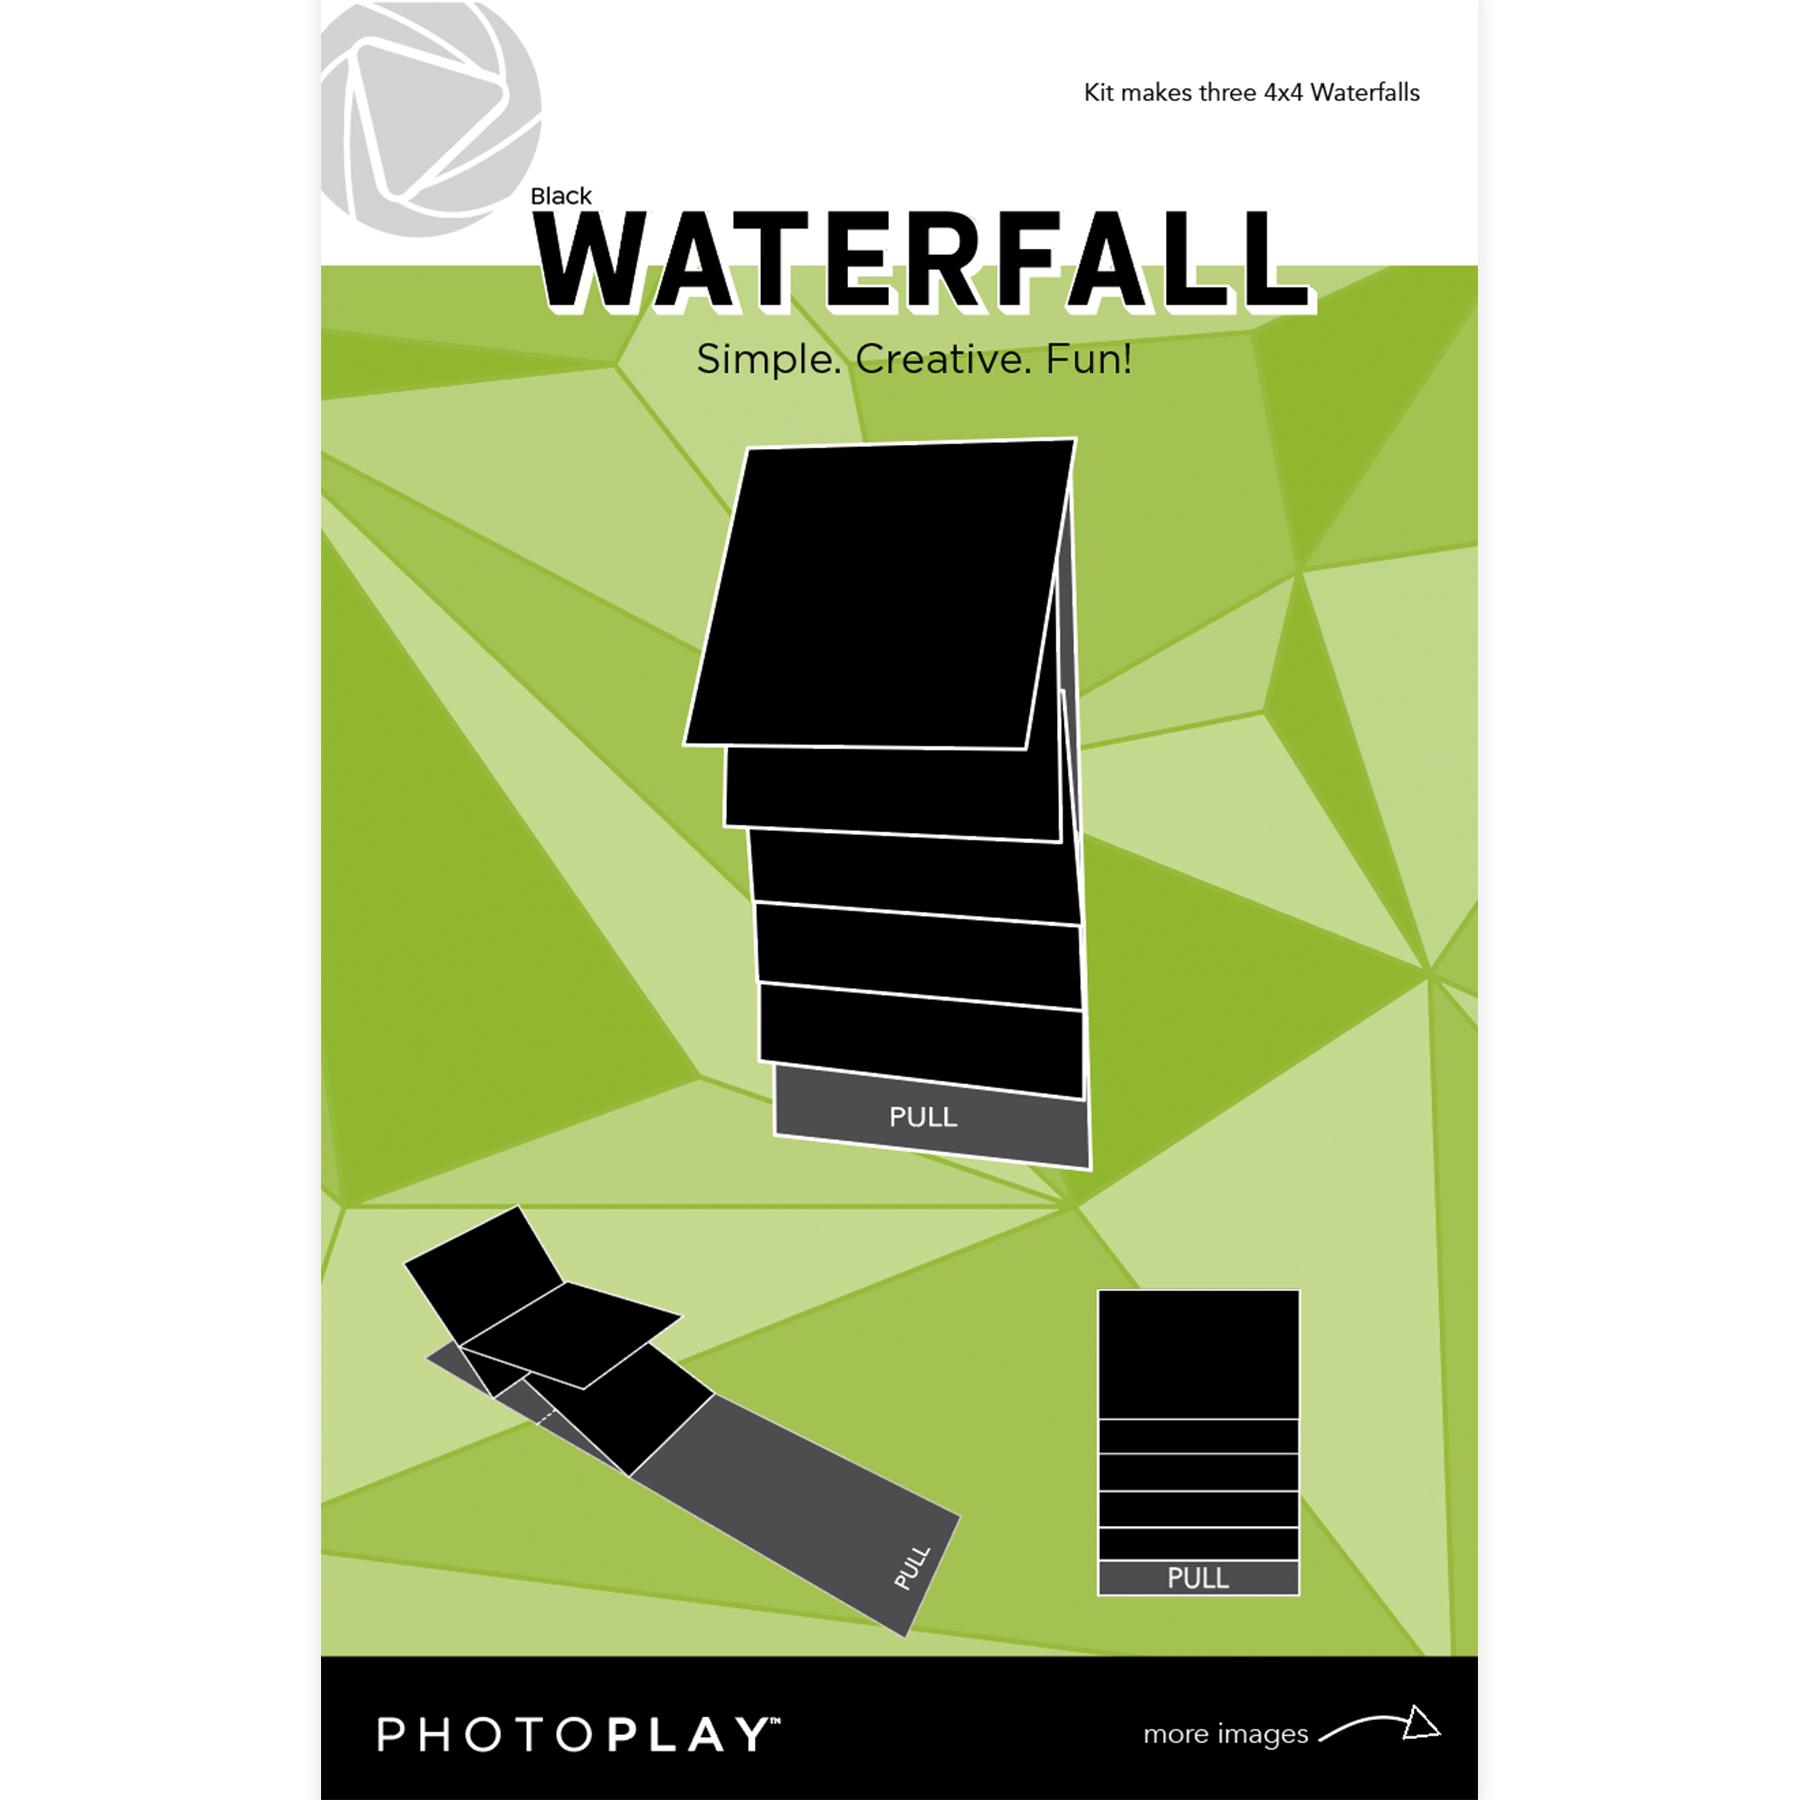 4X4 Waterfall Kit, Maker's Series 2 - Mechanical (Black)